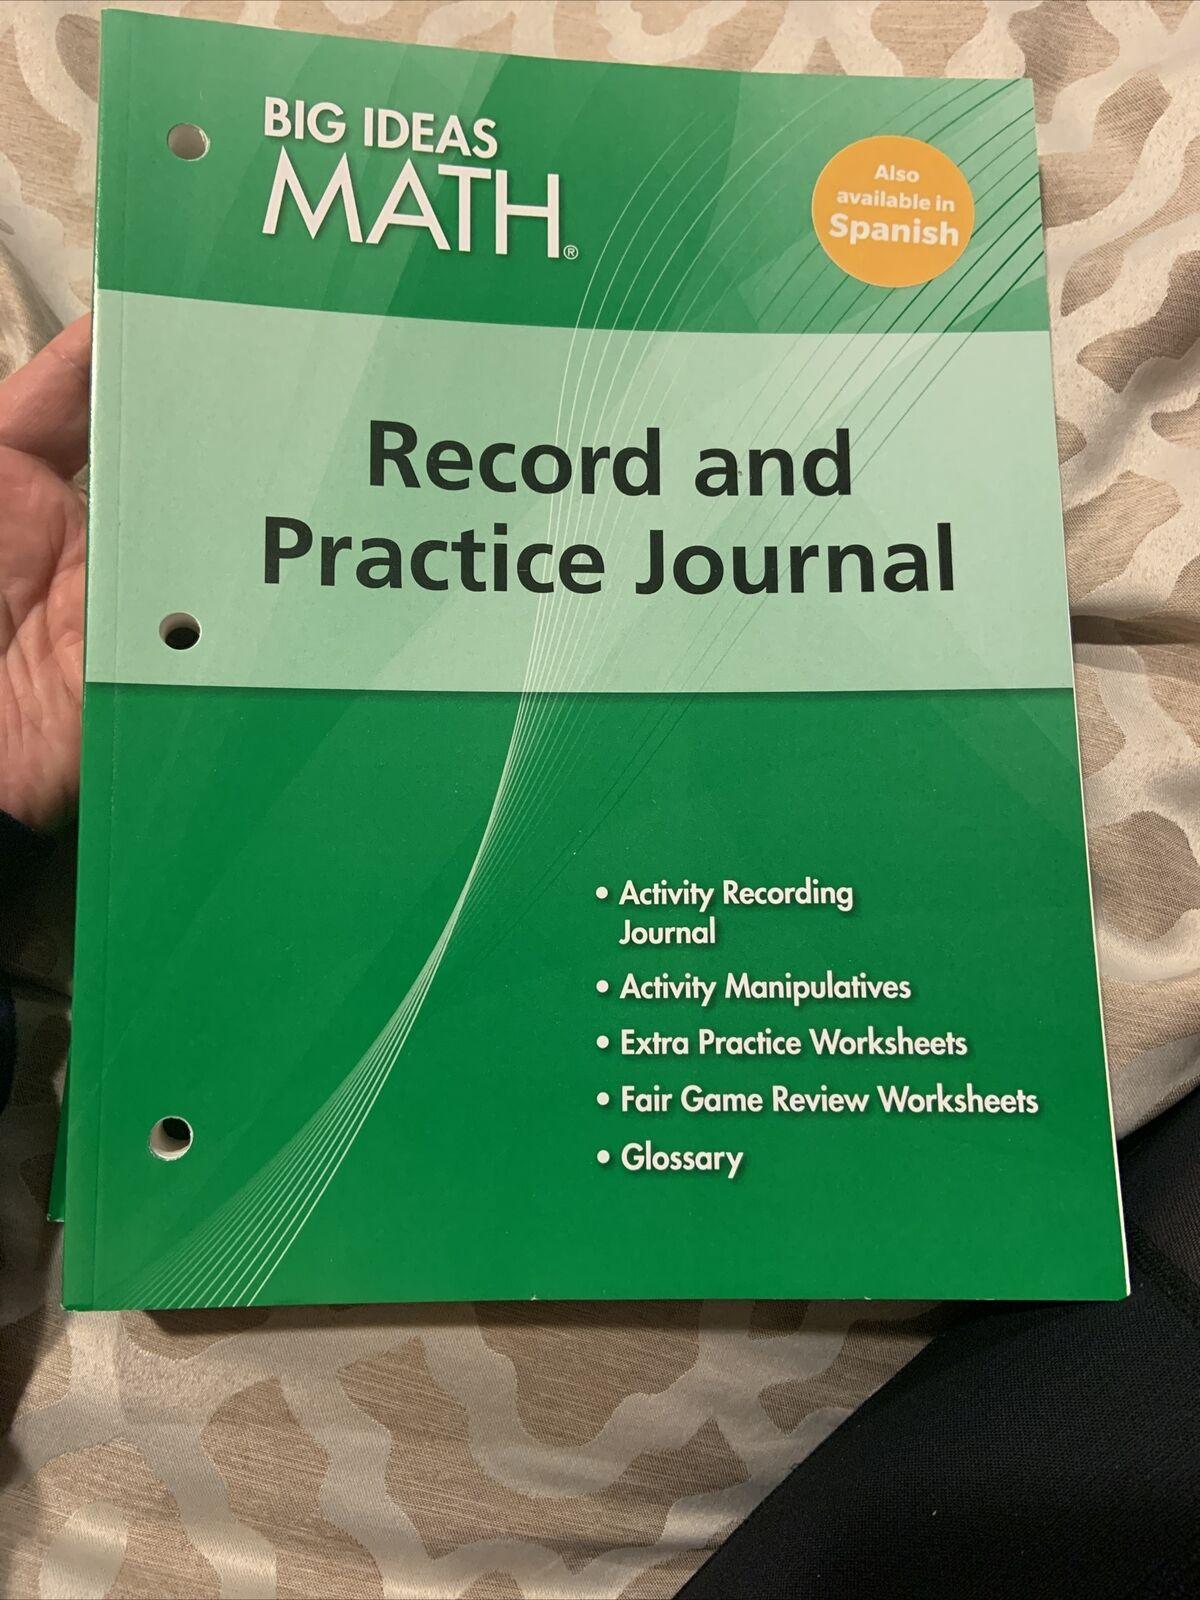 Big Ideas Math Record Practice Journal Grade 6 Green Common Core 9781608404605 For Sale Online Ebay [ 1600 x 1200 Pixel ]